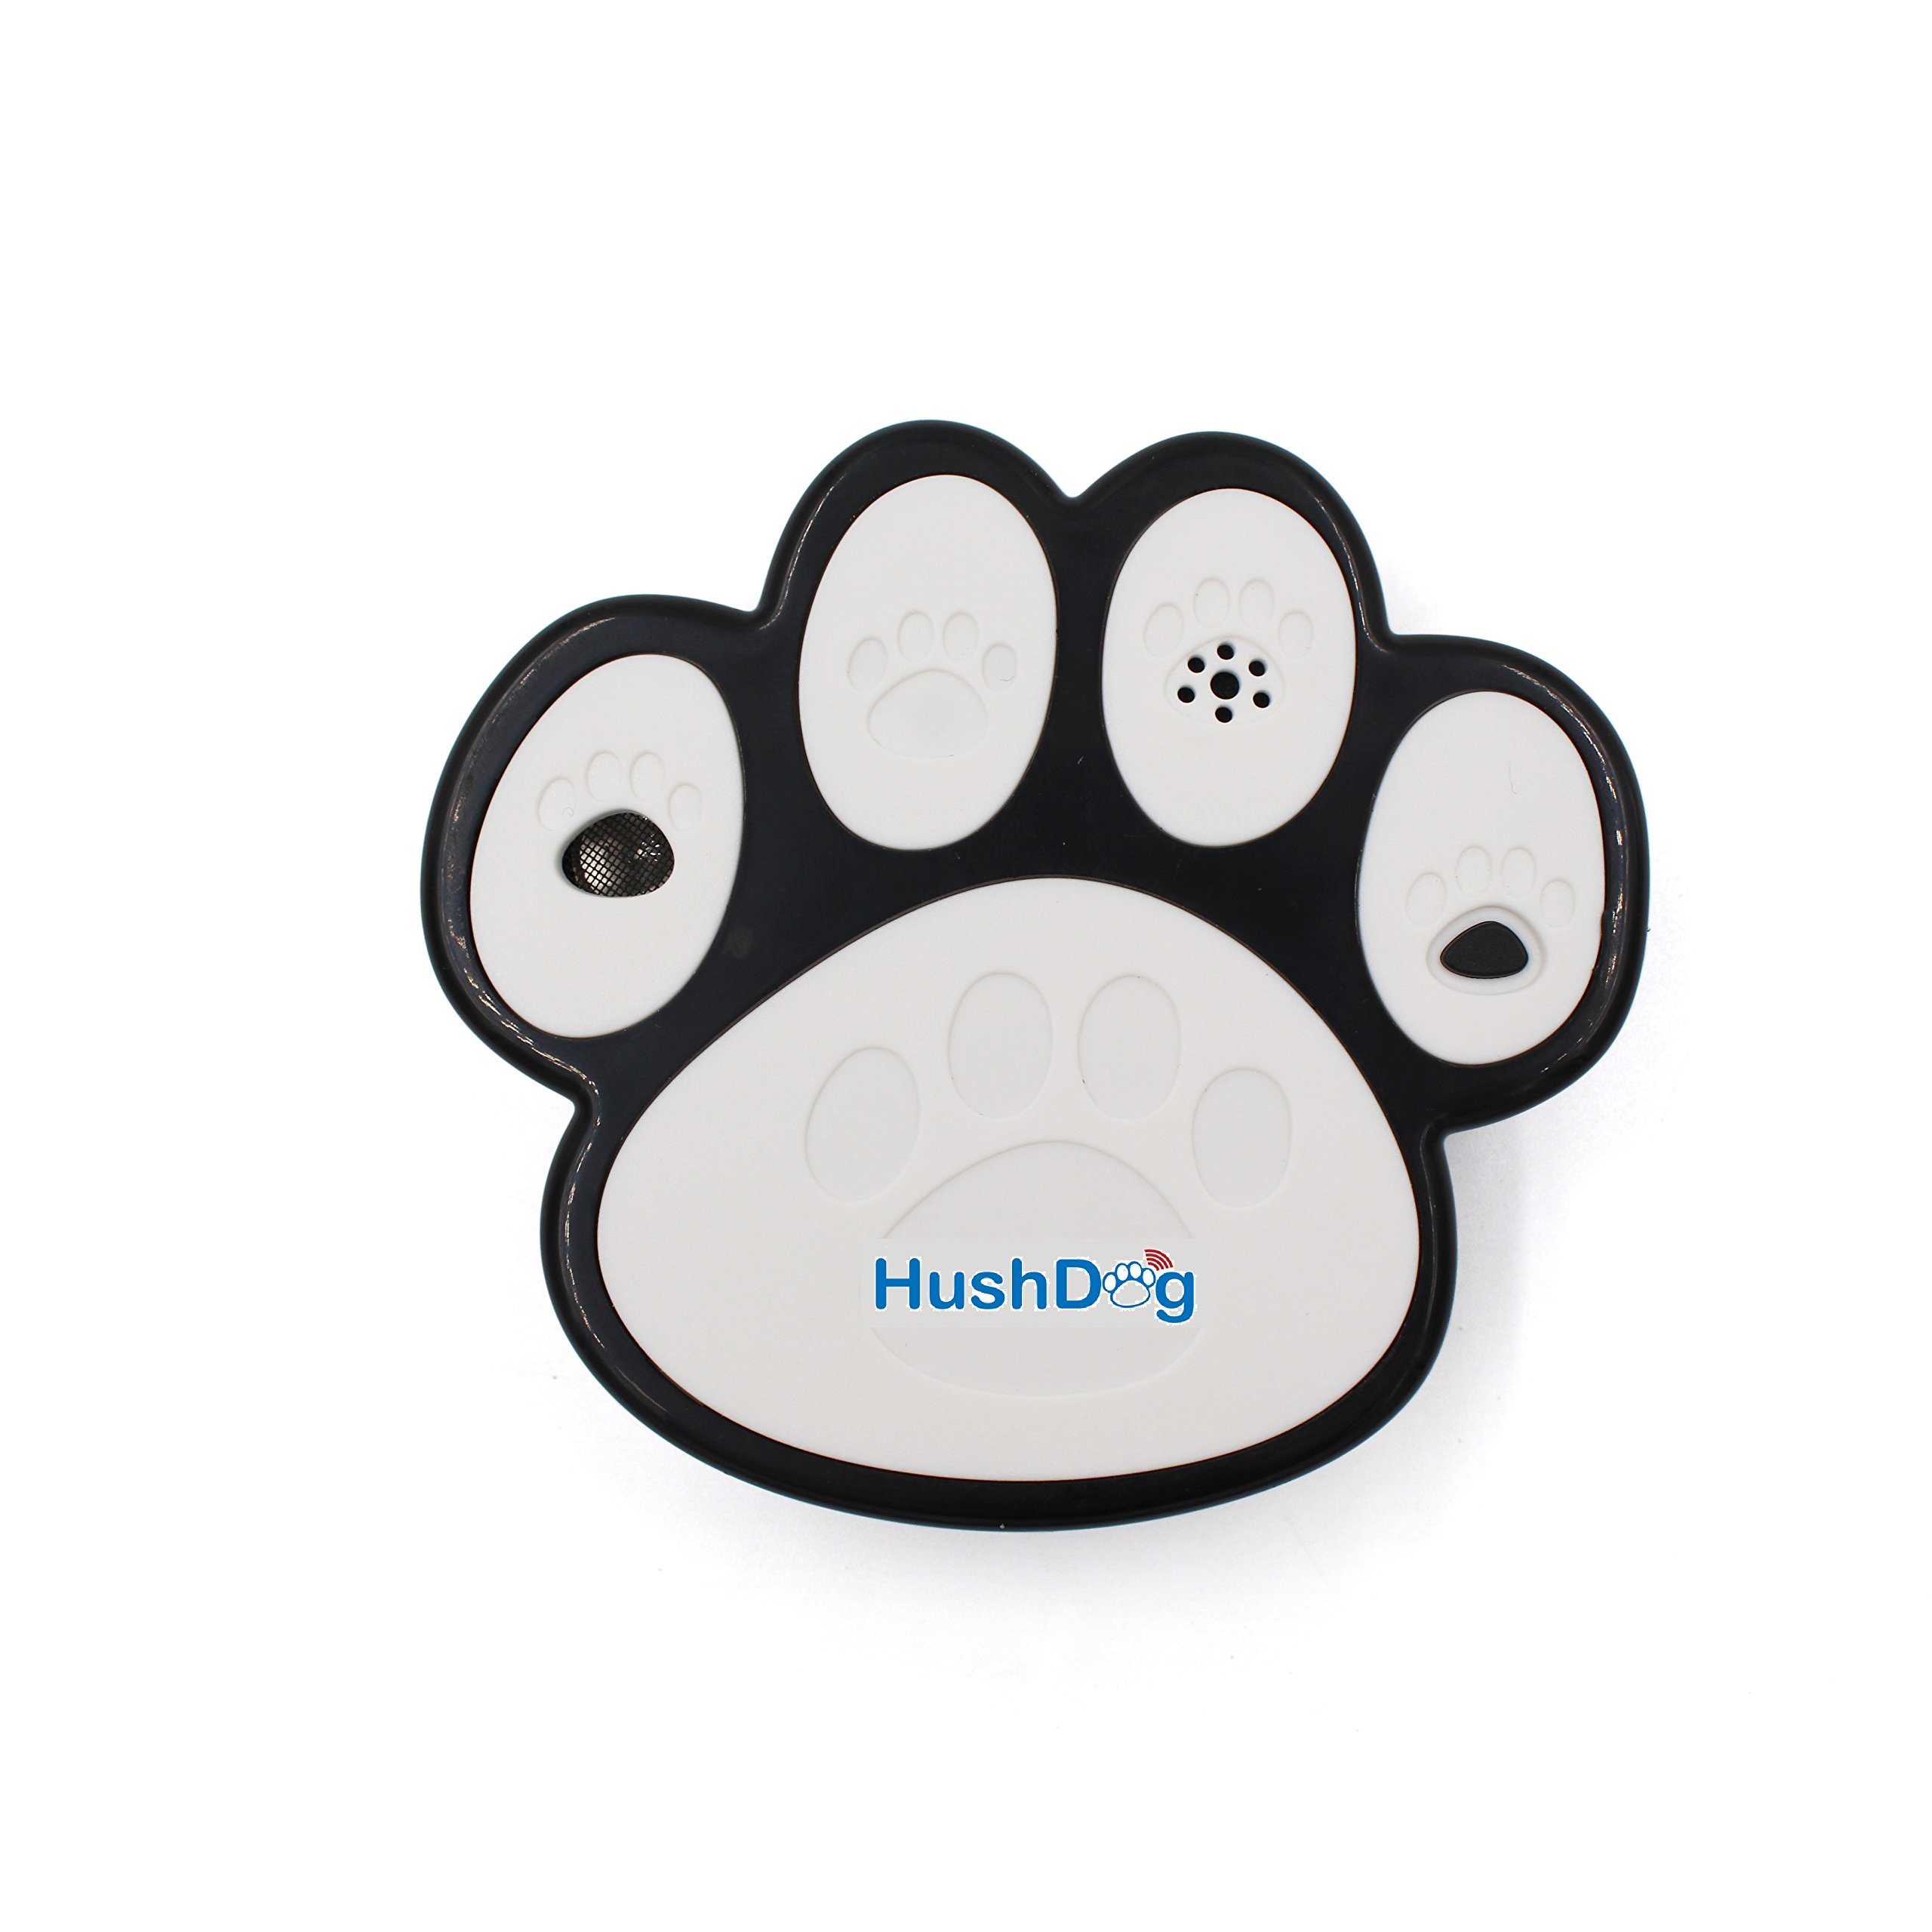 {NEW AND IMPROVED} 2018 UPGRADED DOG\'S PAW DESIGN, ULTRASONIC ANTI DOG BARKING DEVICE, ULTRASONIC DOG BARK DETERRENT STOP BARKING DOG SILENCER SAFE FOR PETS AND HUMANS DOG TRAINING